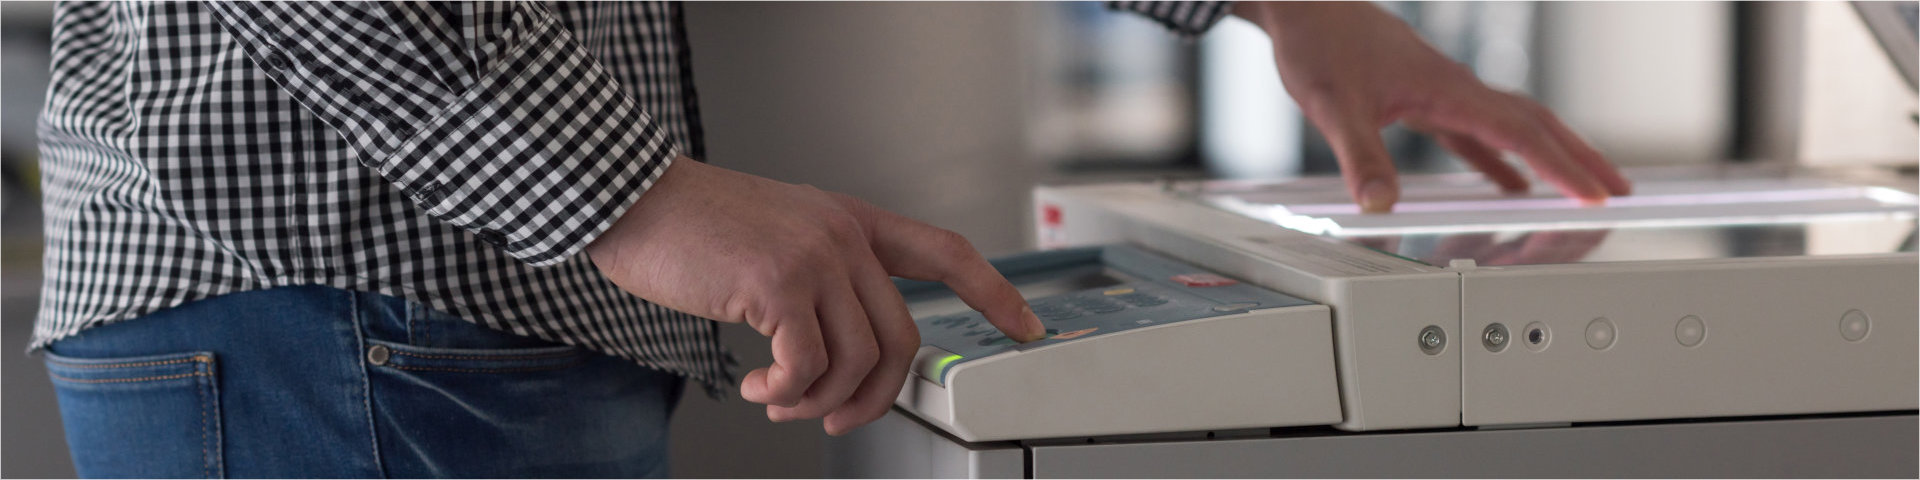 a man pushing a button in a photocopier machine